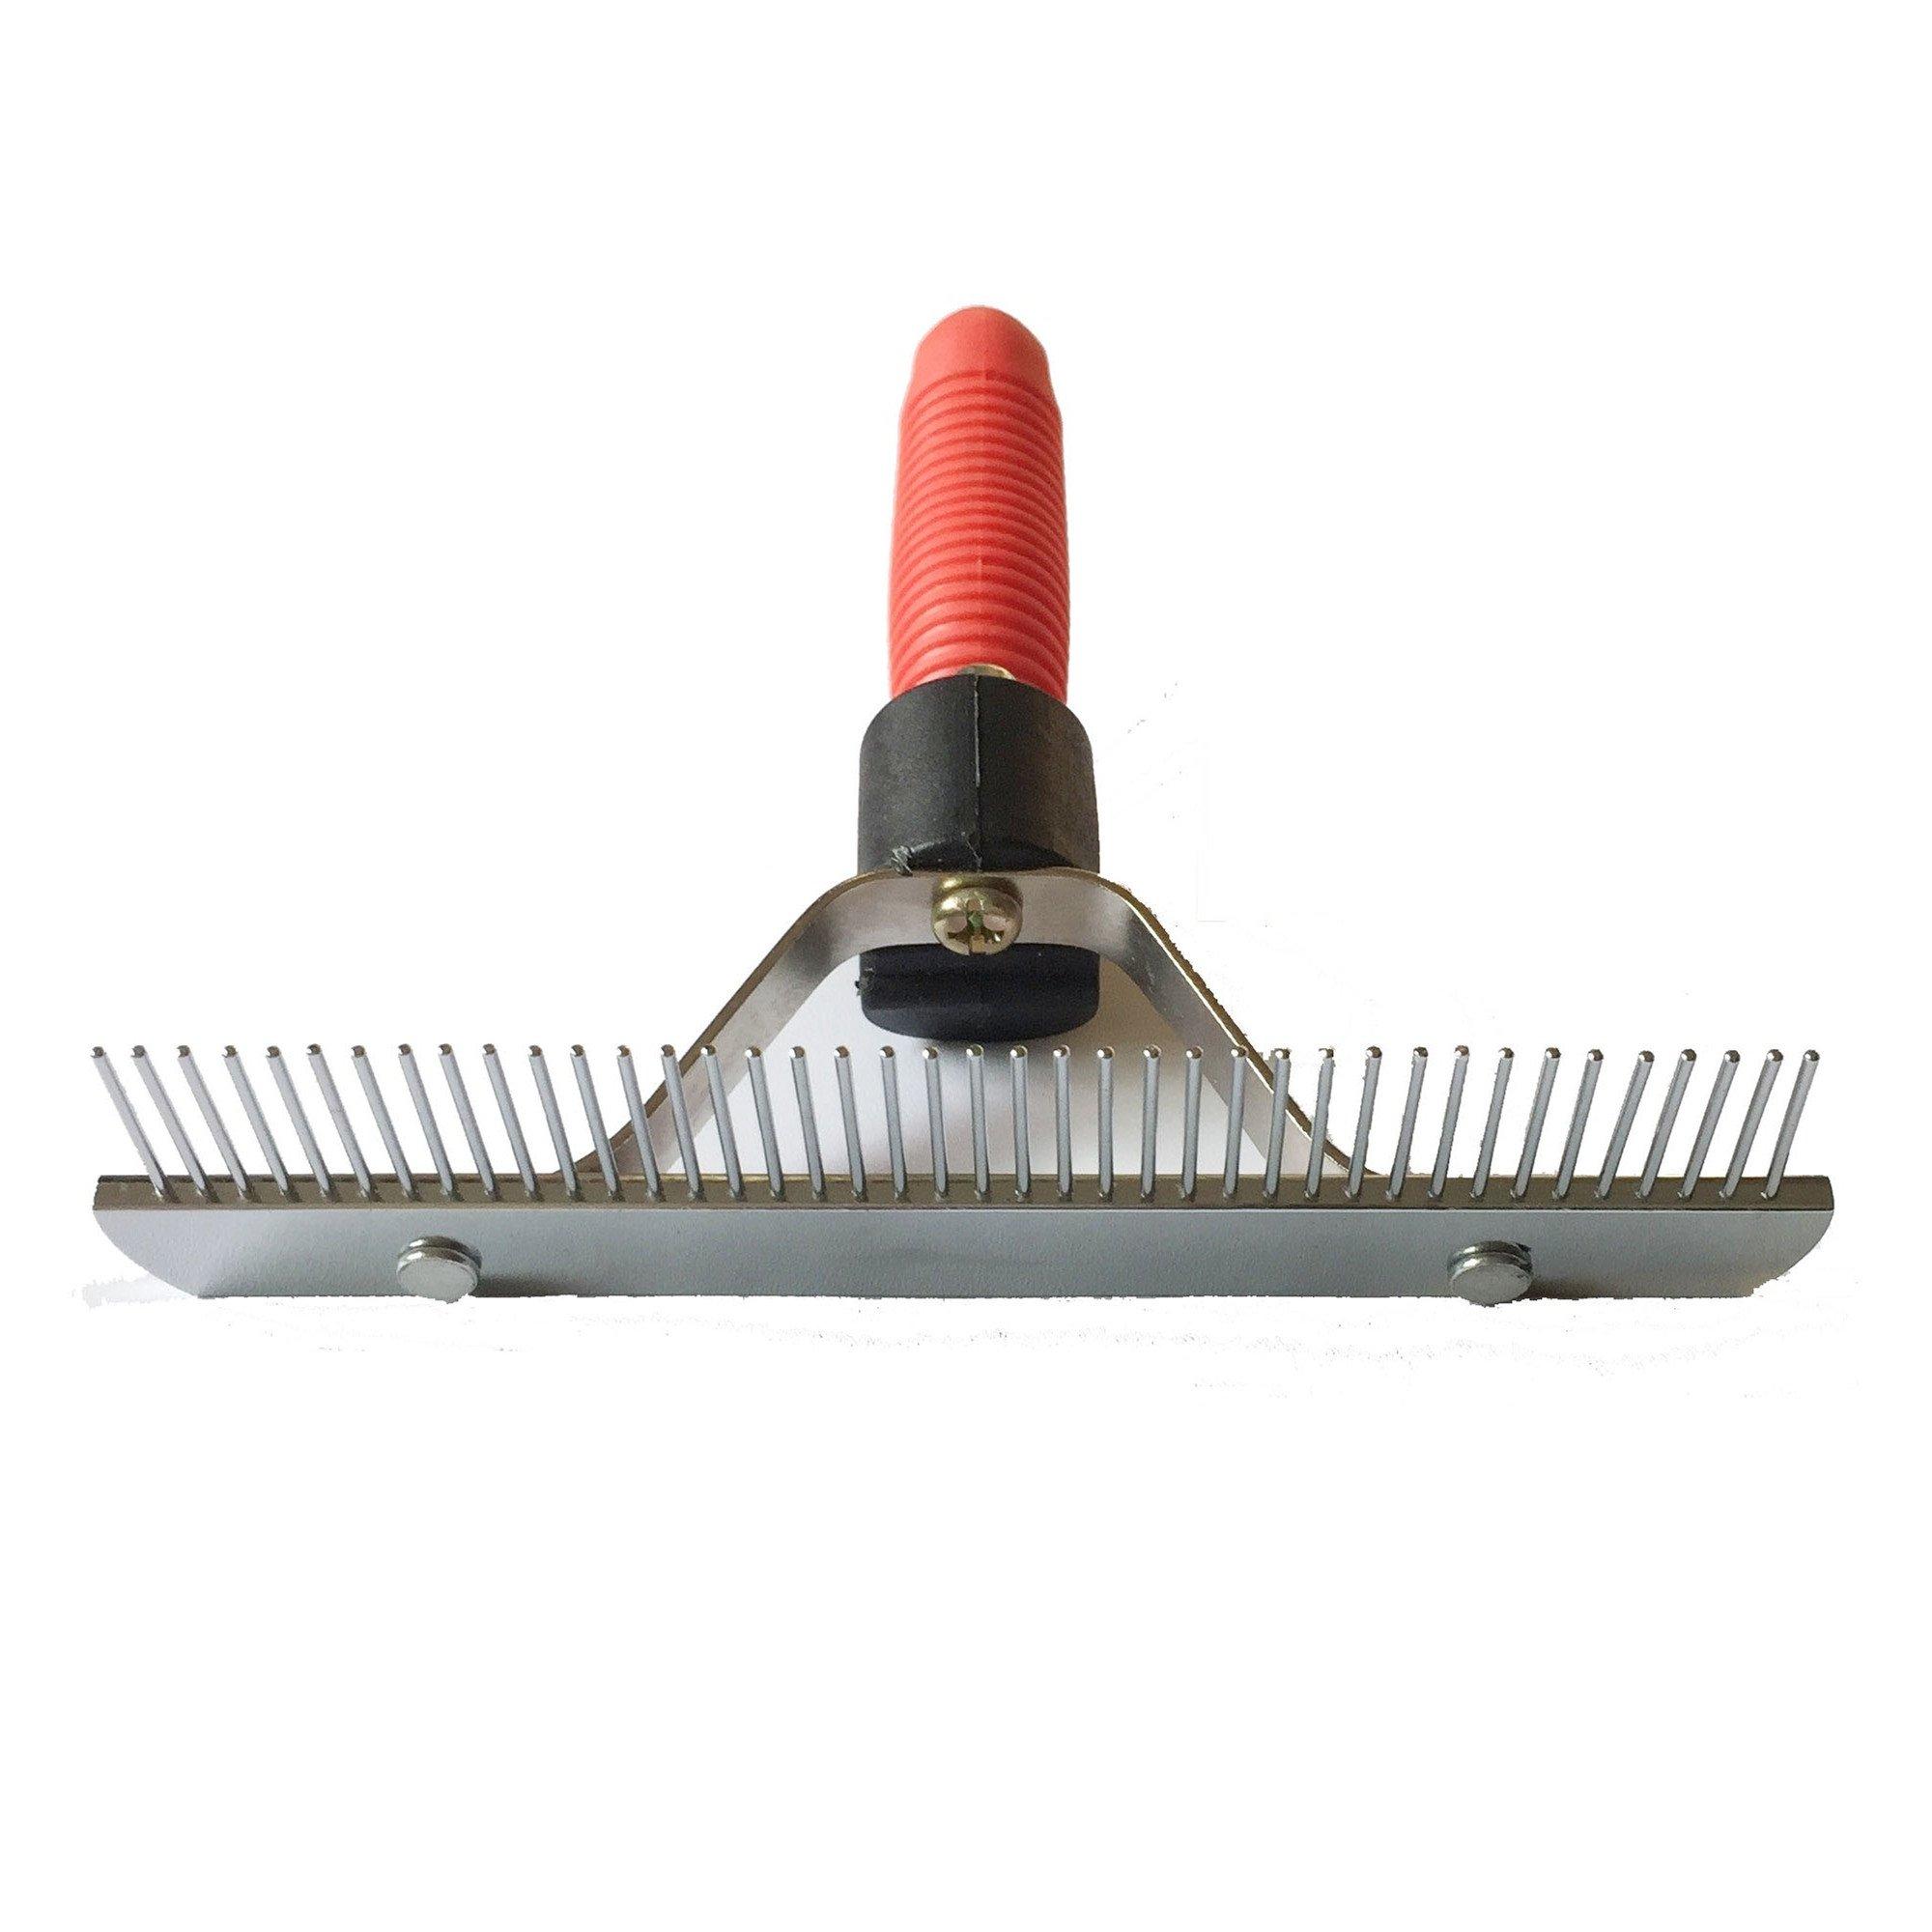 Pet Comb Extra-Large Rake Comb Grooming Brush Deshedding Tool Beauty Comb For Large Dogs Golden Retriever Husky German Shepherd